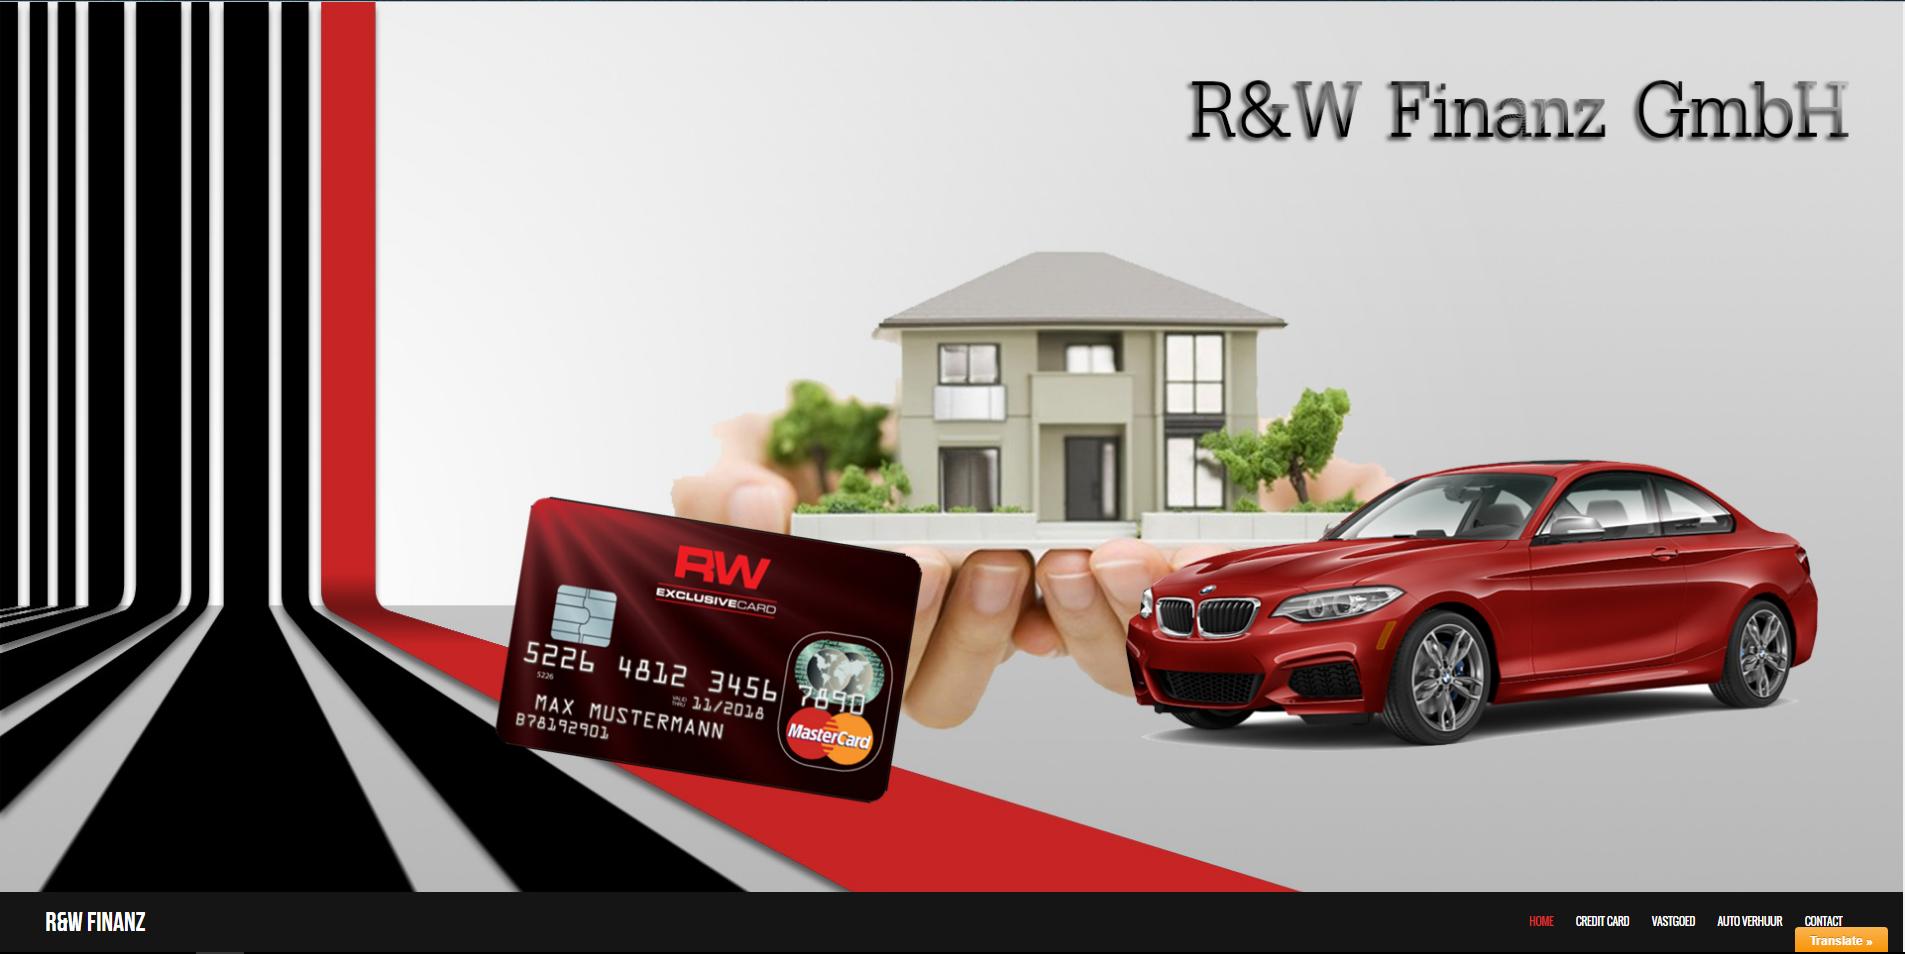 R&W finanz